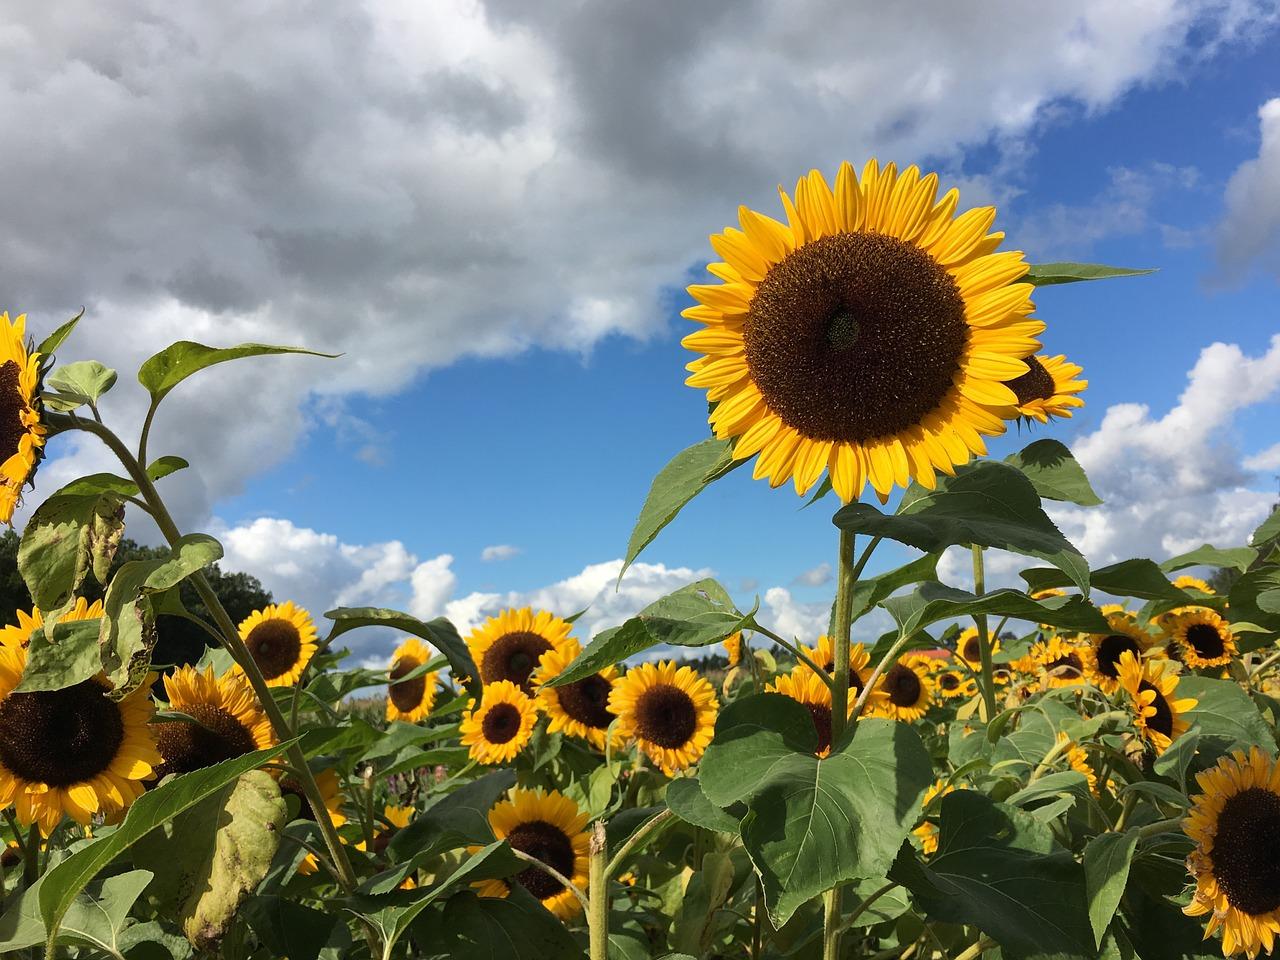 sunflower-961739_1280